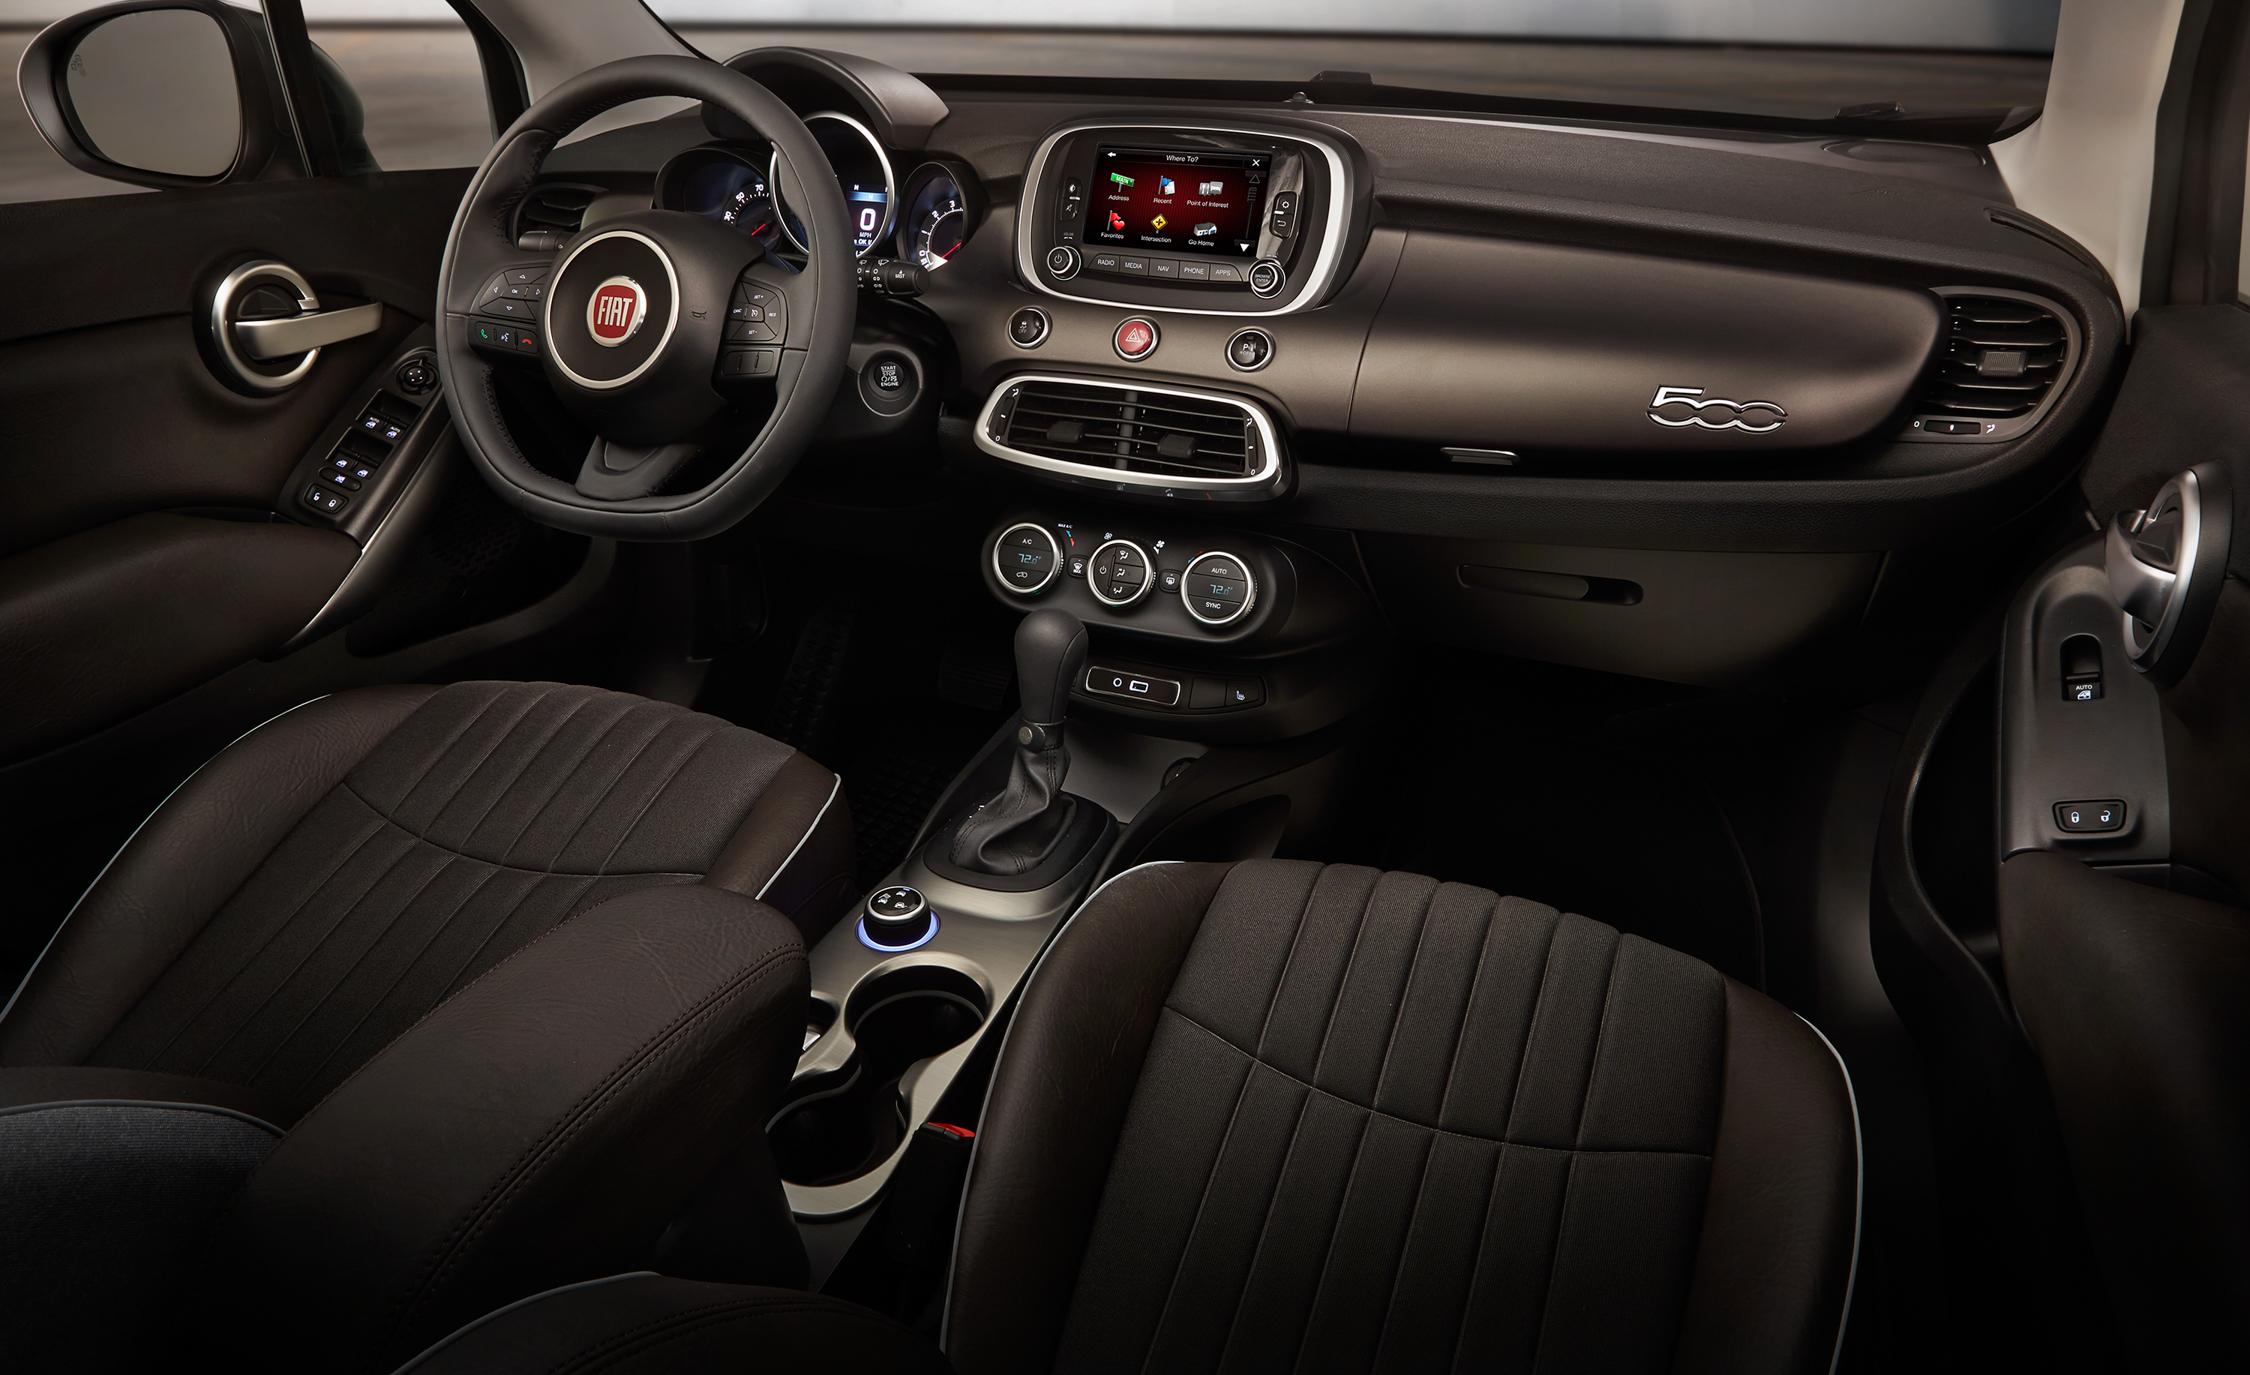 2016 Fiat 500X Lounge Interior Dashboard